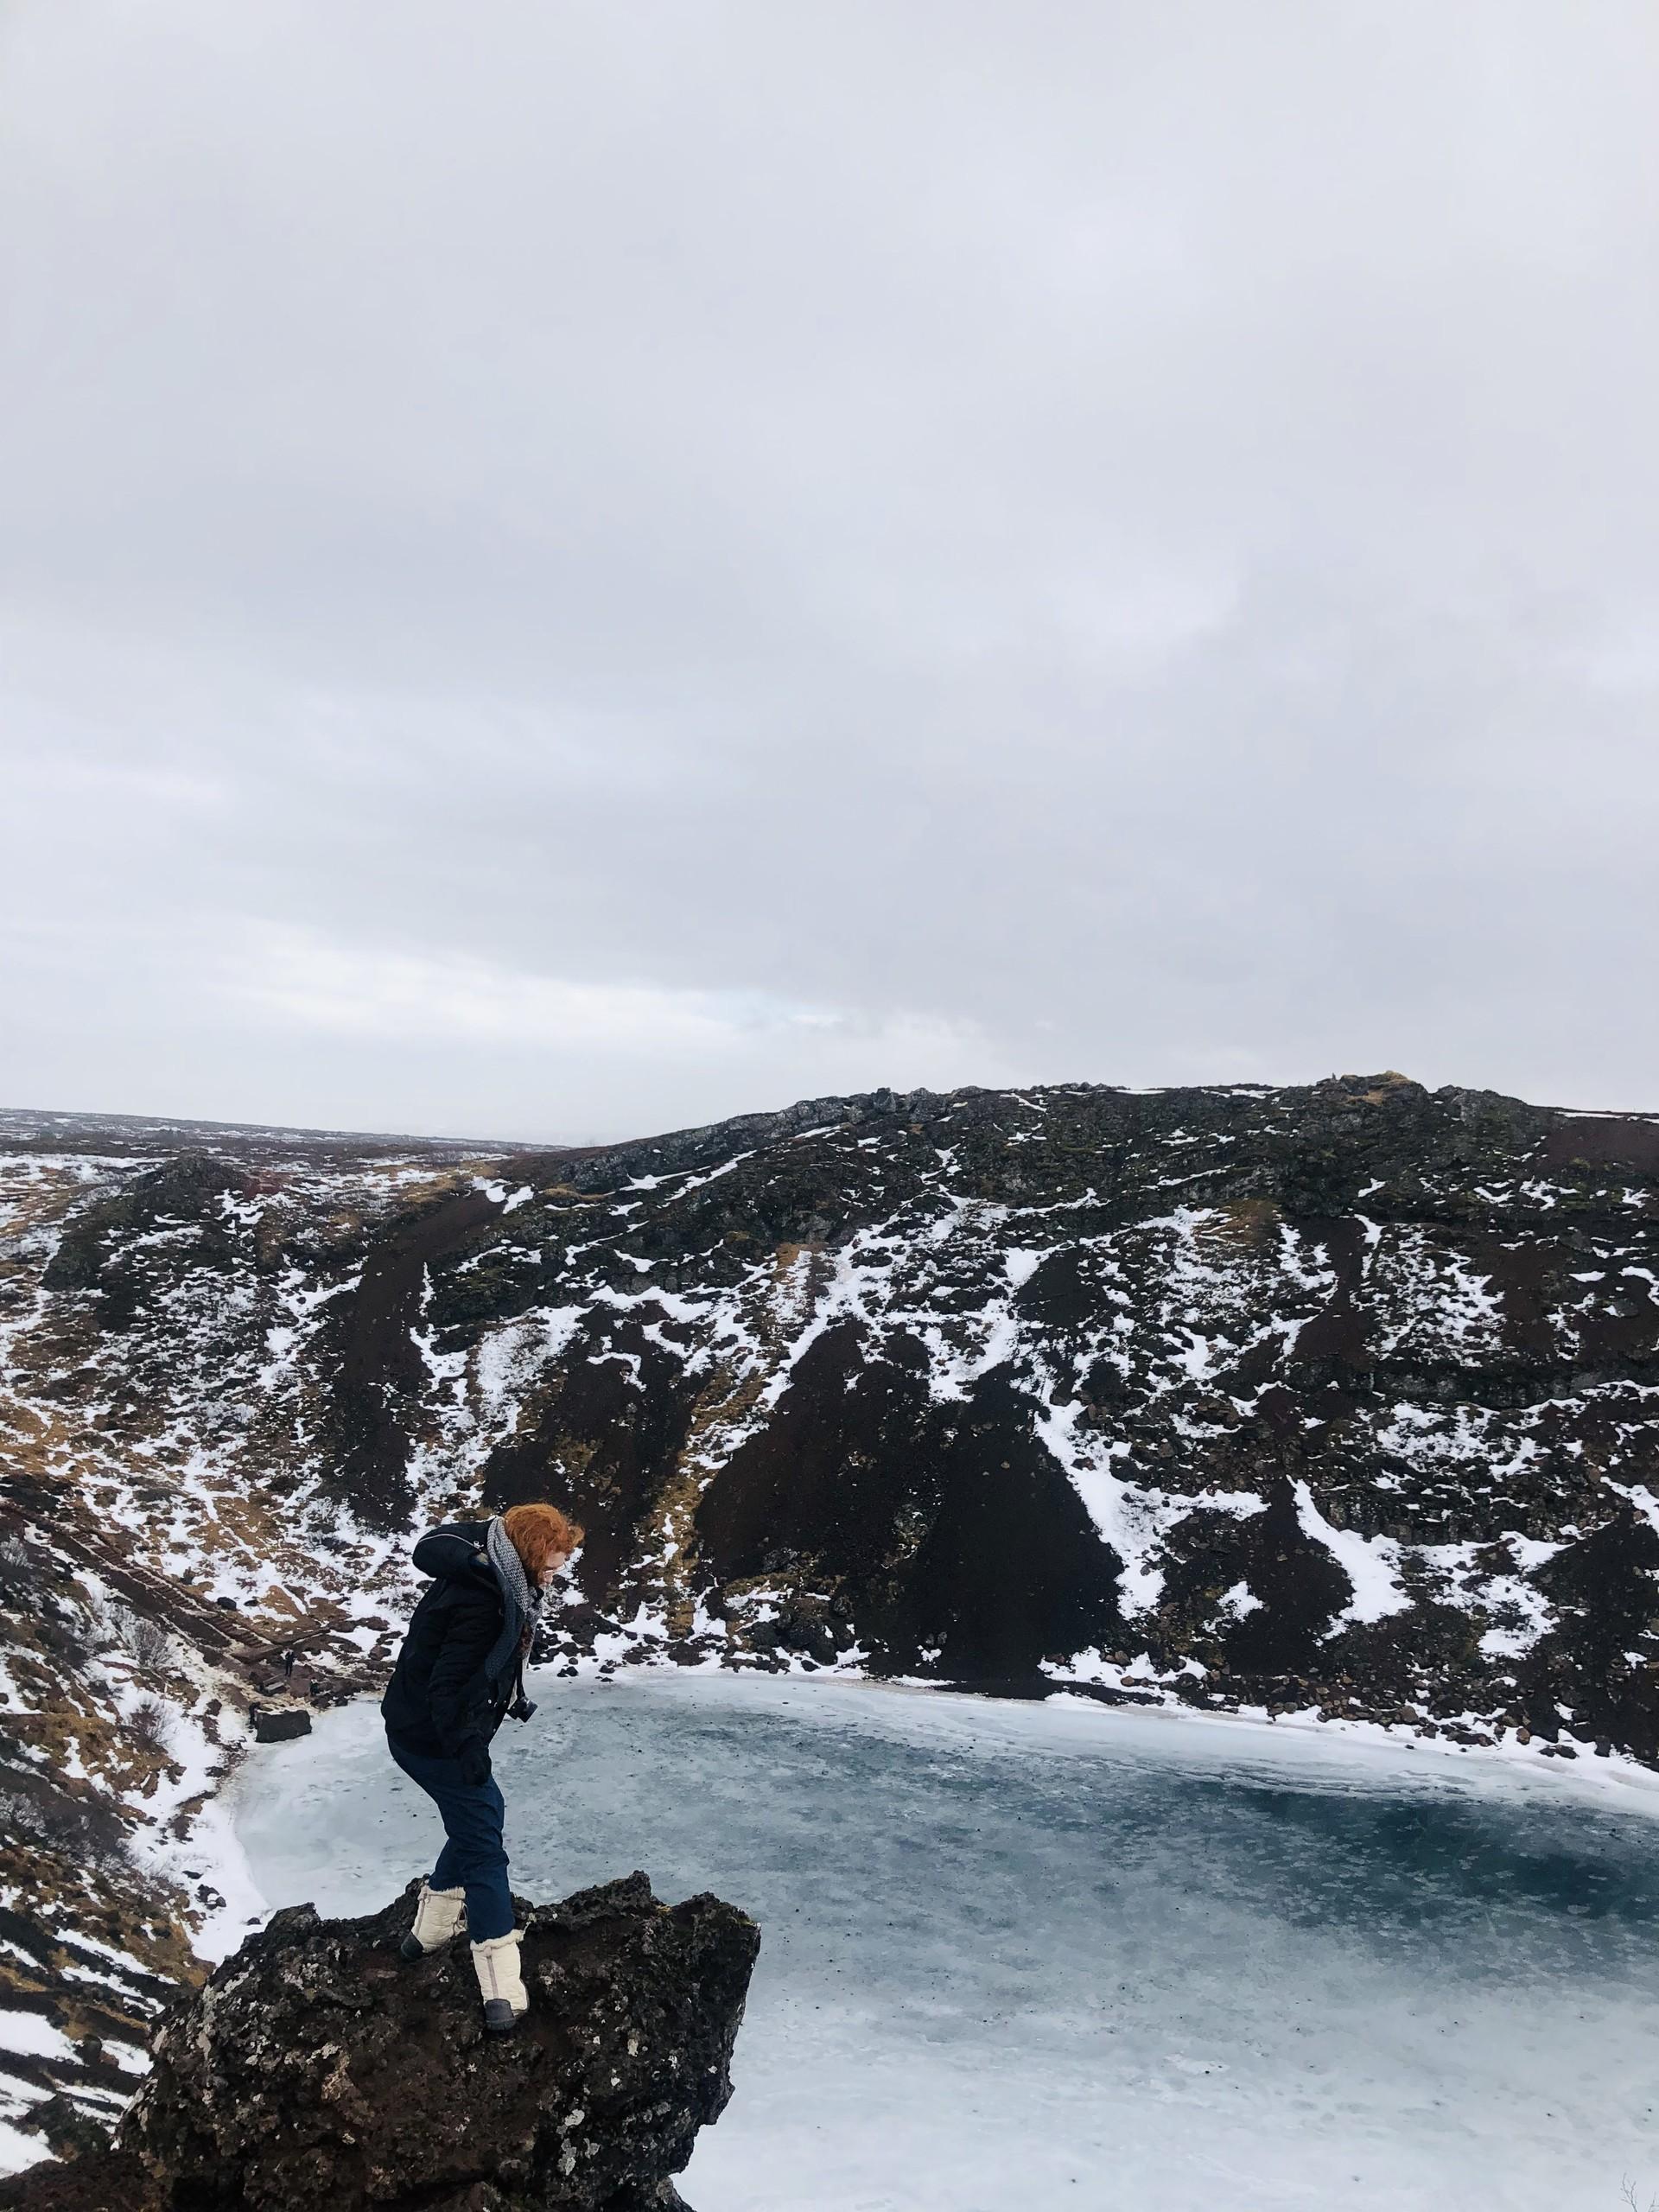 Volontariat en Islande (2/2) : Reykjavik et environnement